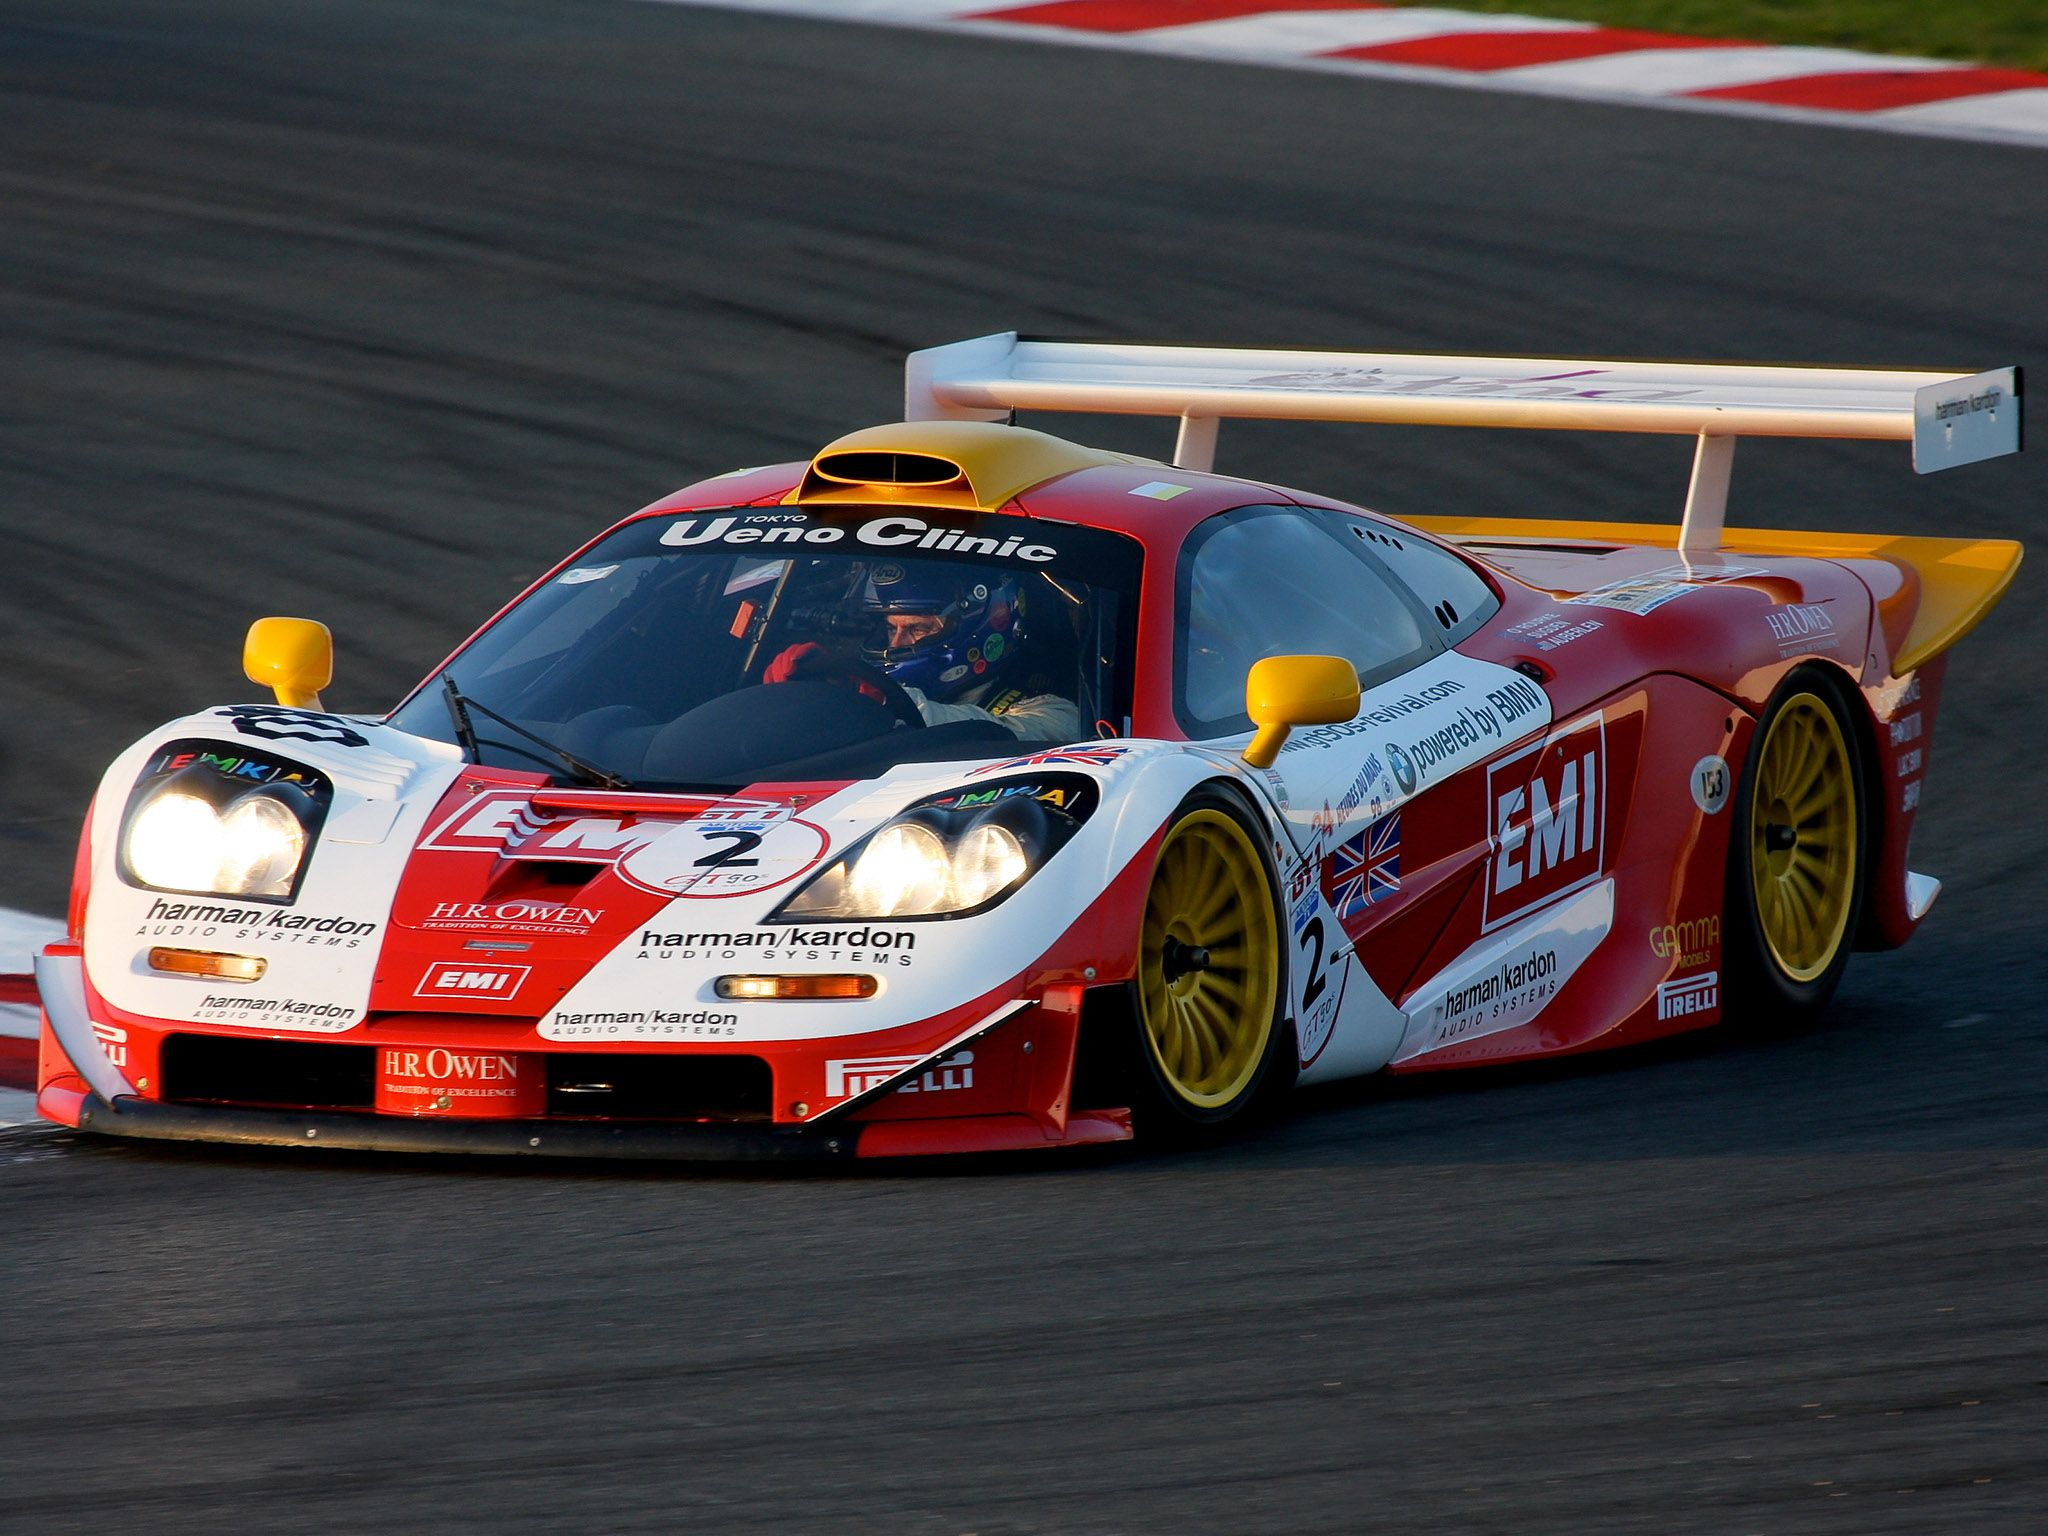 1997 McLaren F1 GTR longtail | Motorsports | Pinterest | Mclaren ...